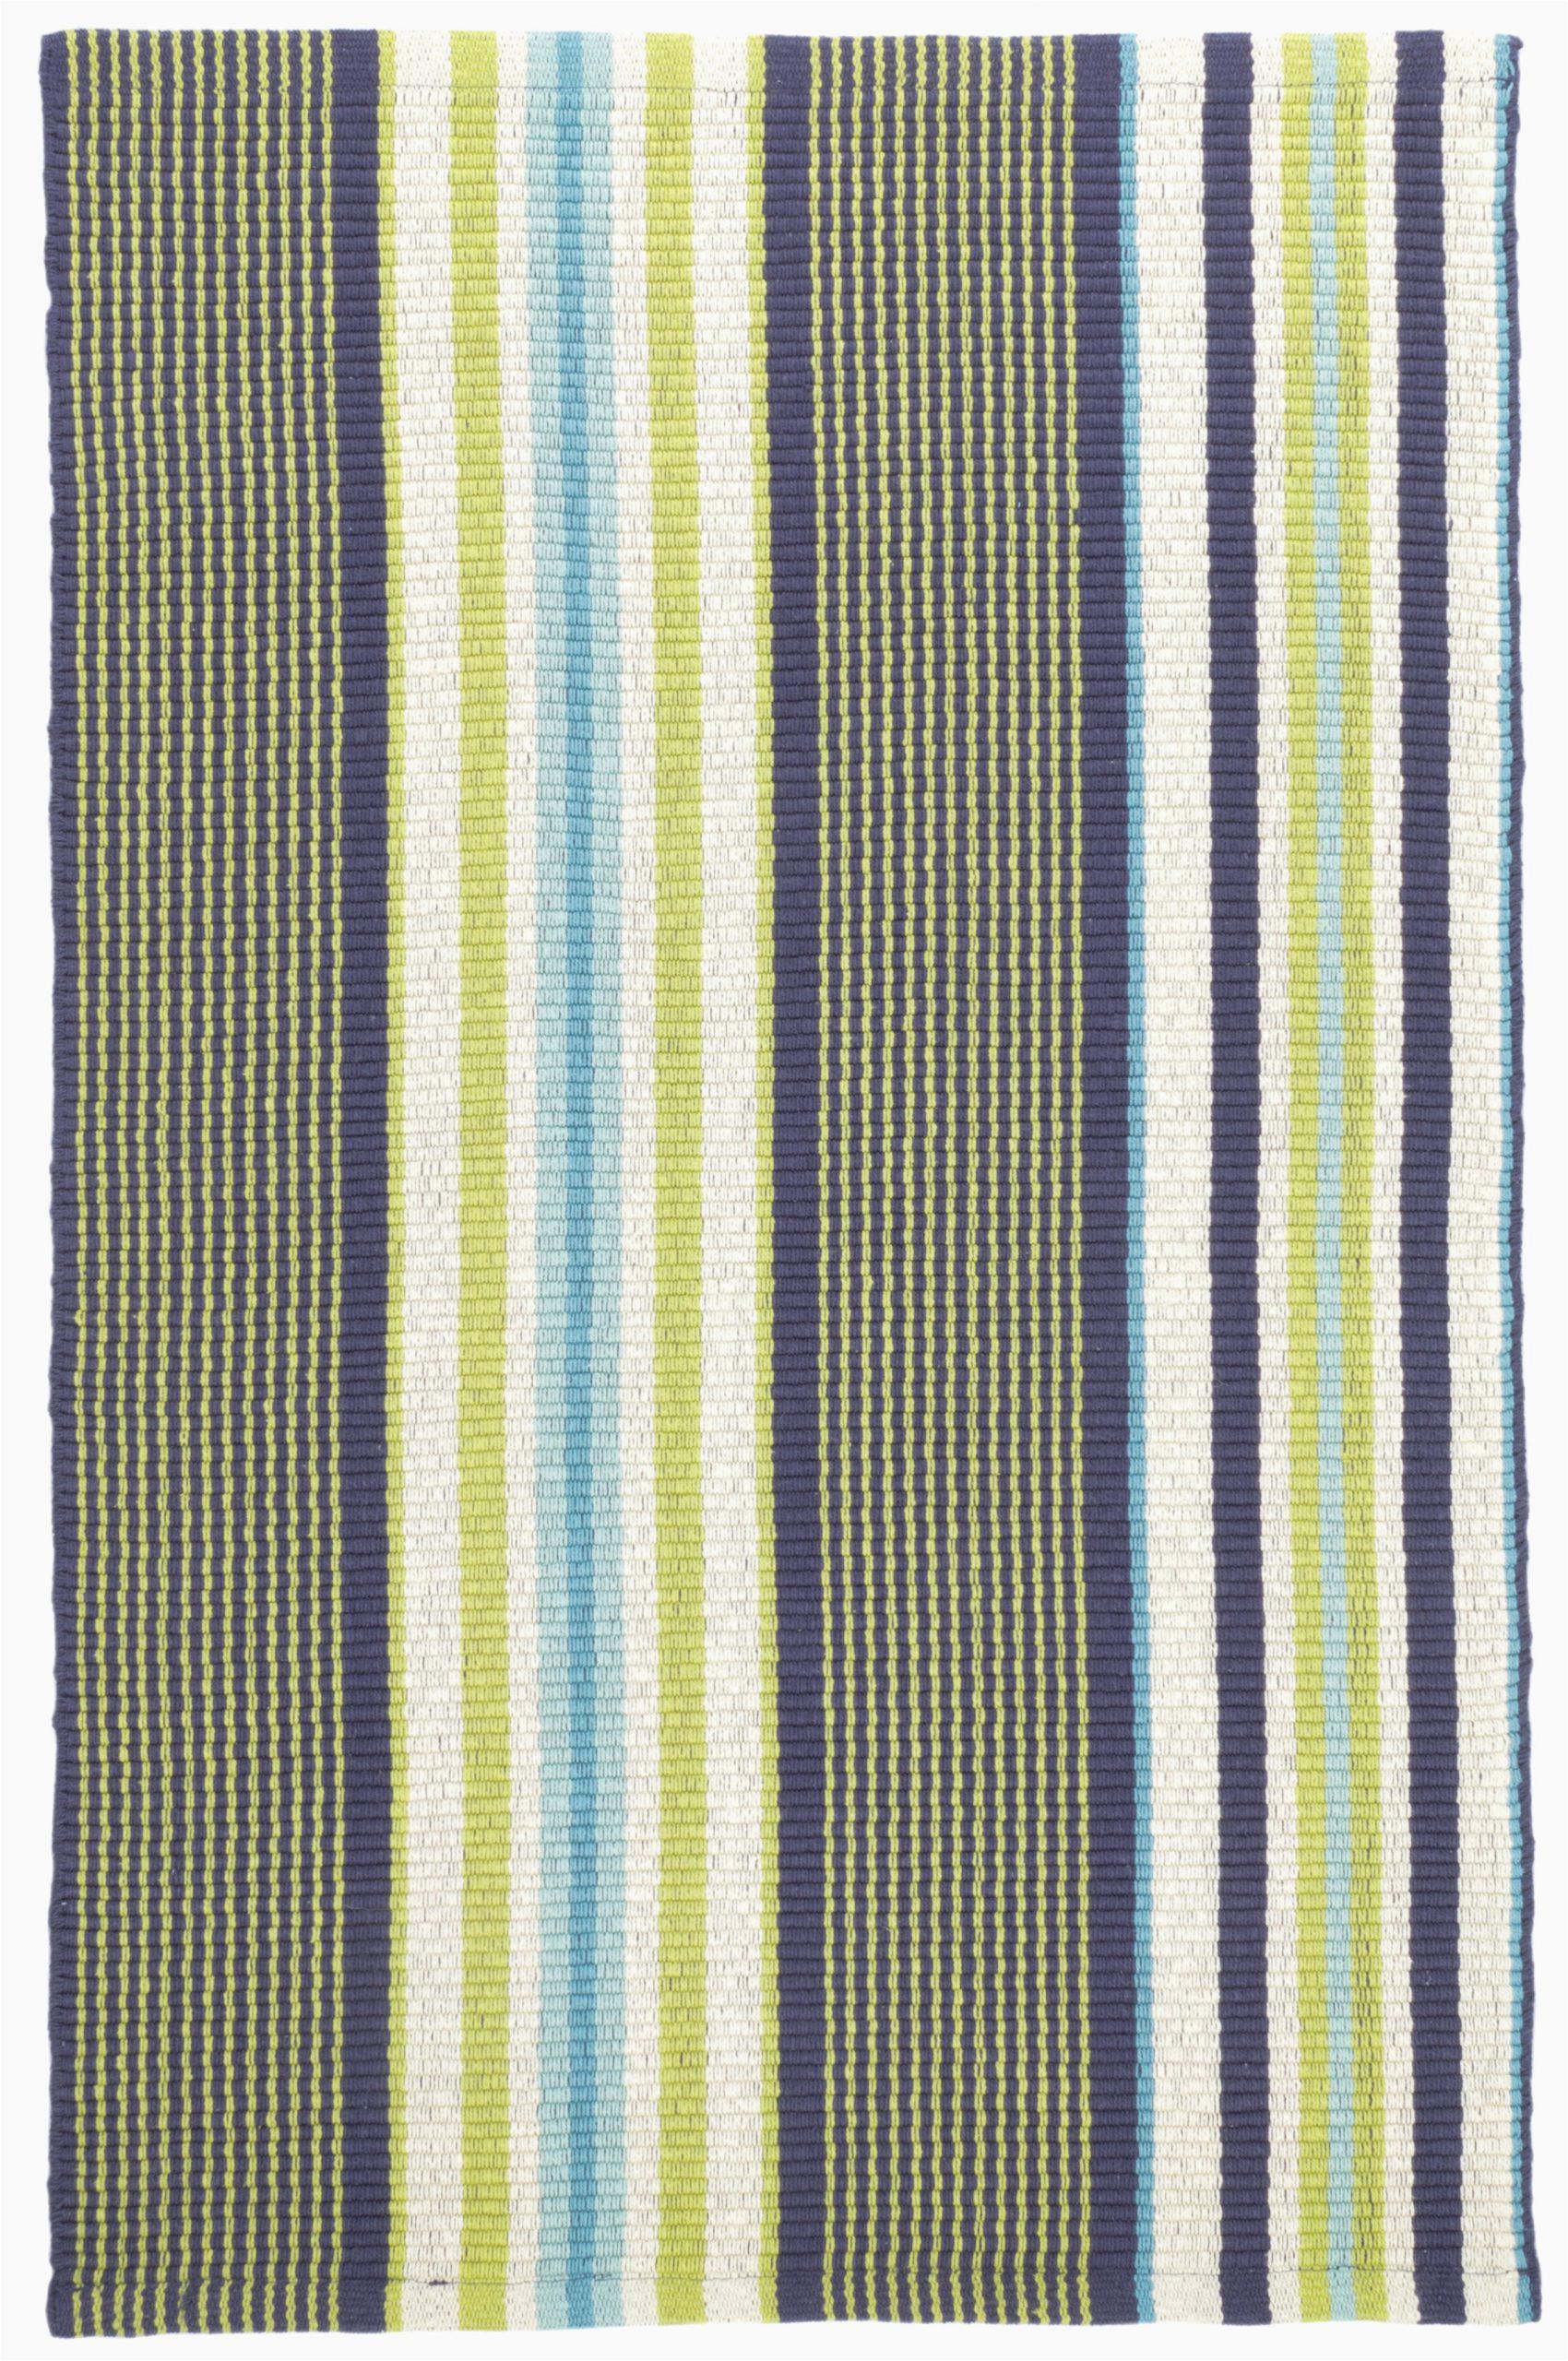 asher striped handmade flatweave cotton bluegreen area rug